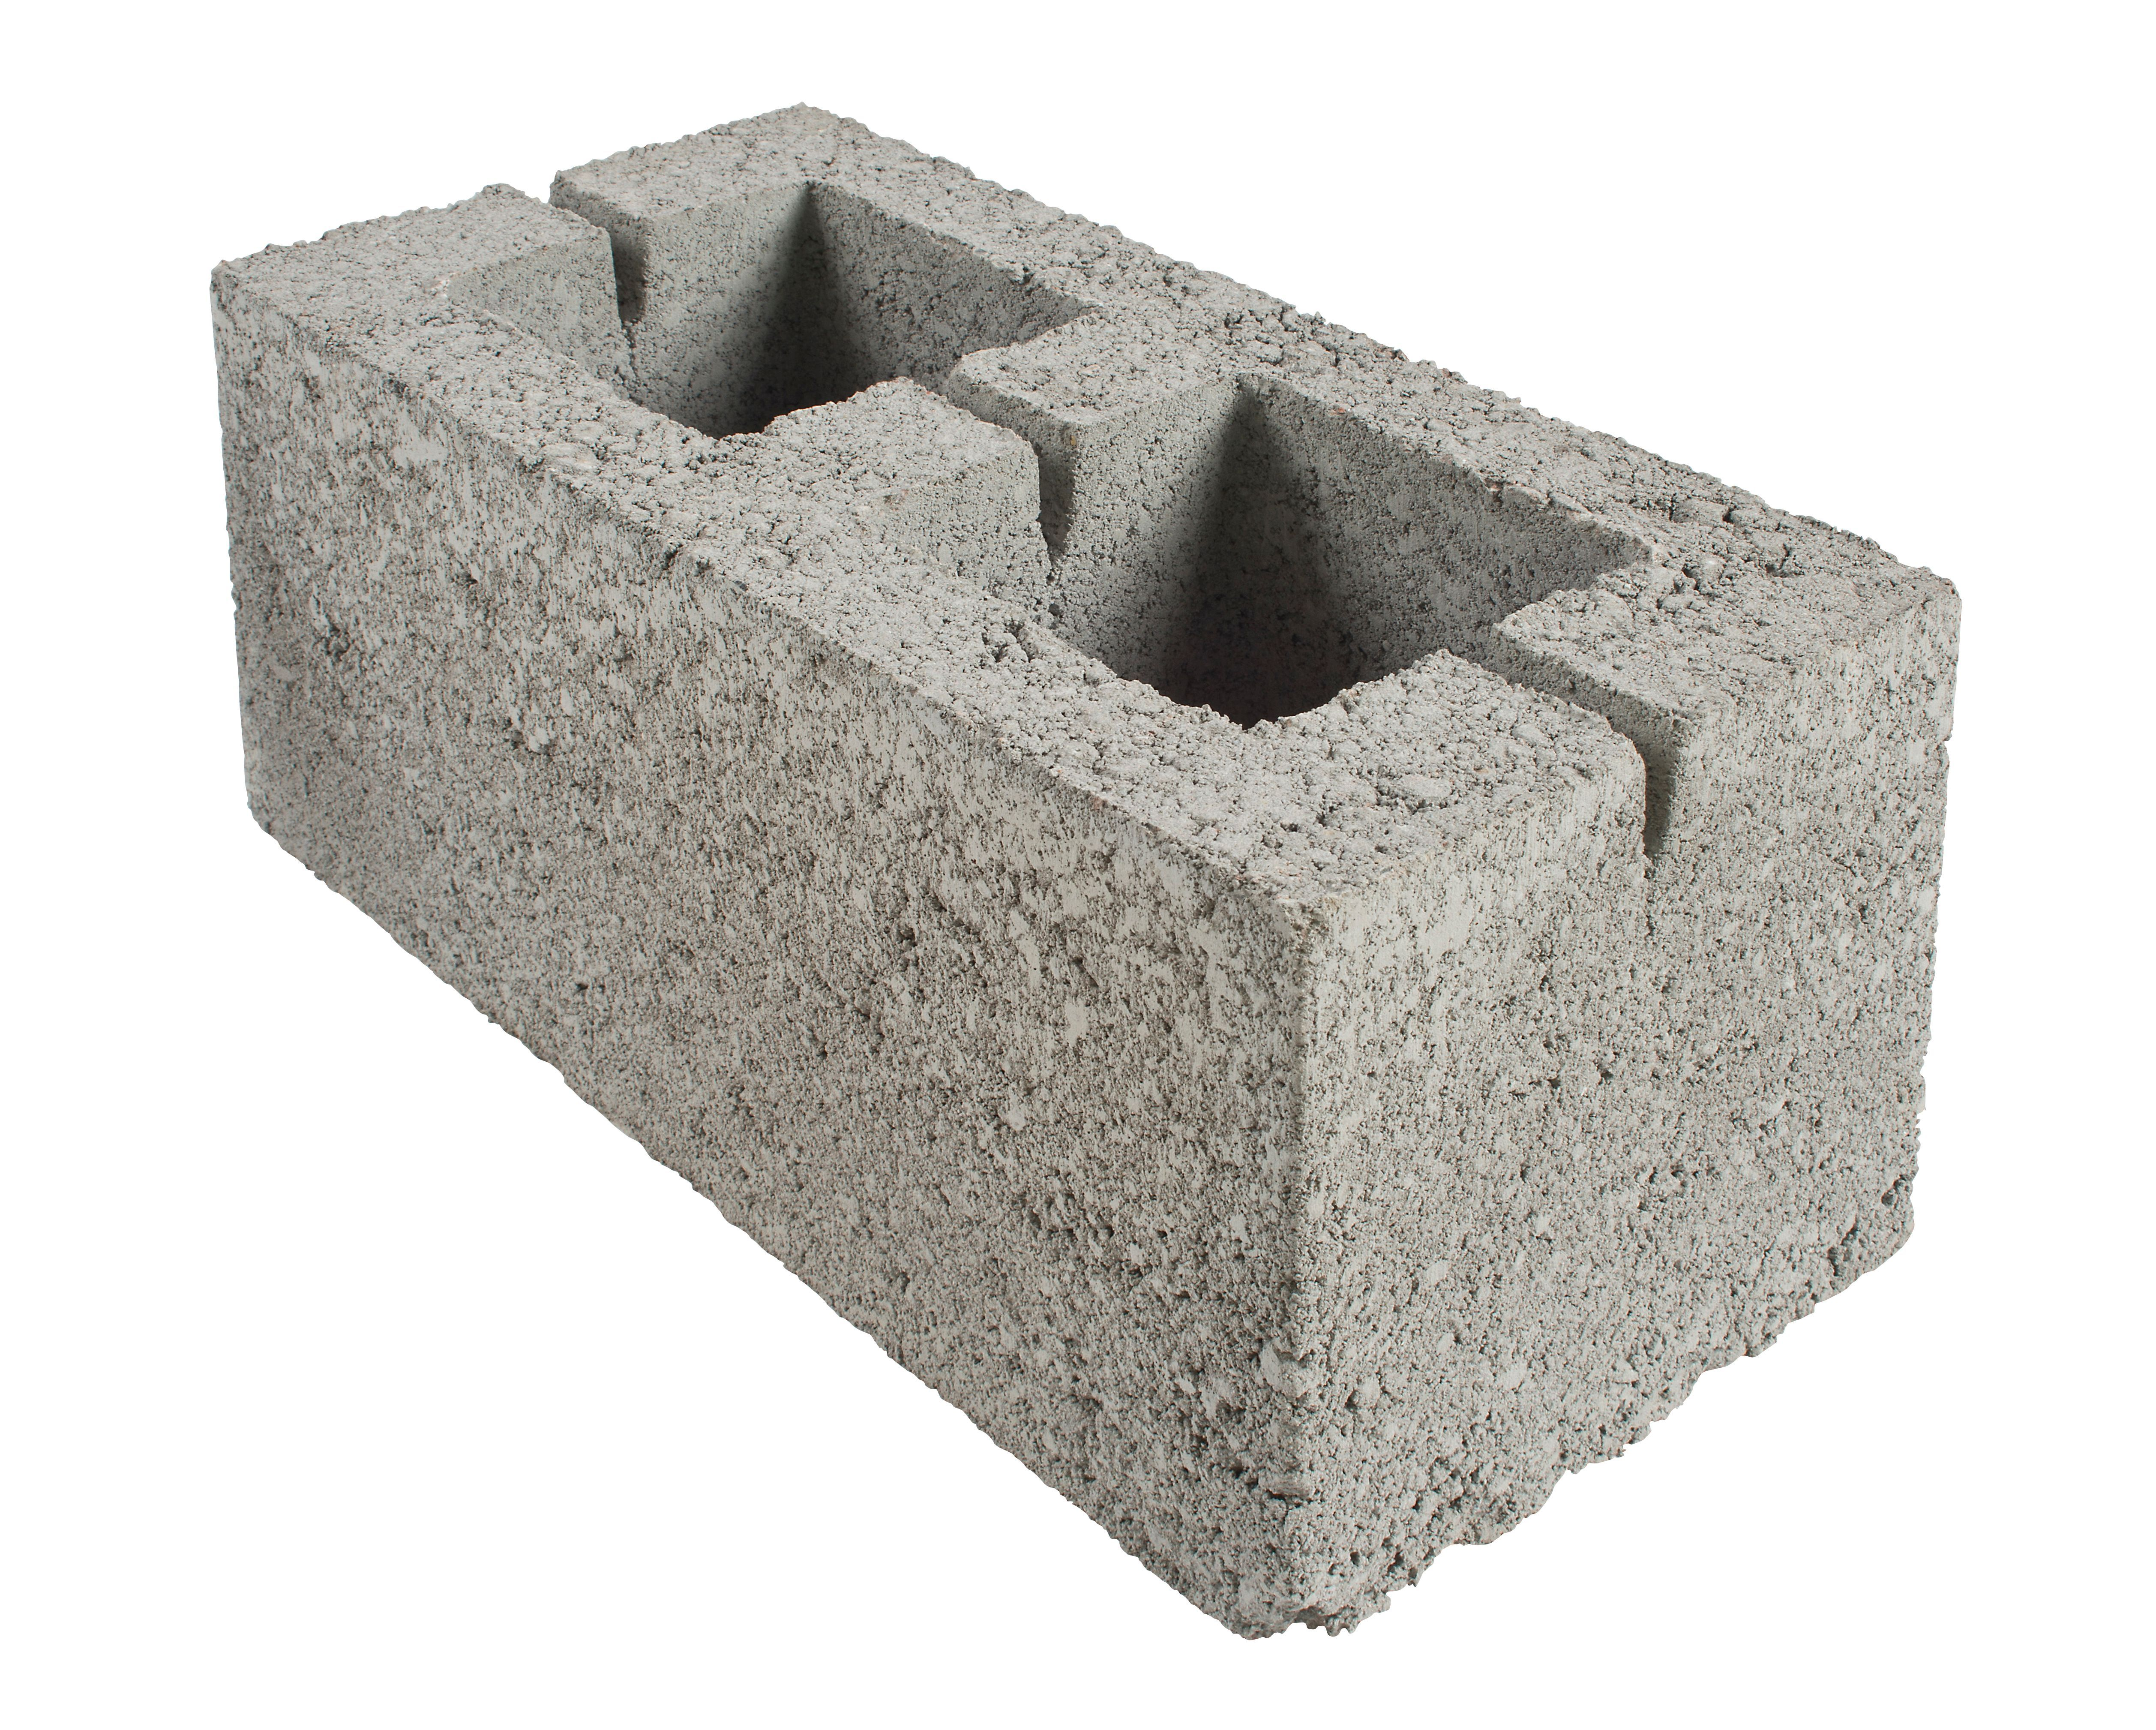 Hollow Dense Concrete Block 7 3n 215mm Travis Perkins Concrete Blocks Concrete Concrete Building Blocks